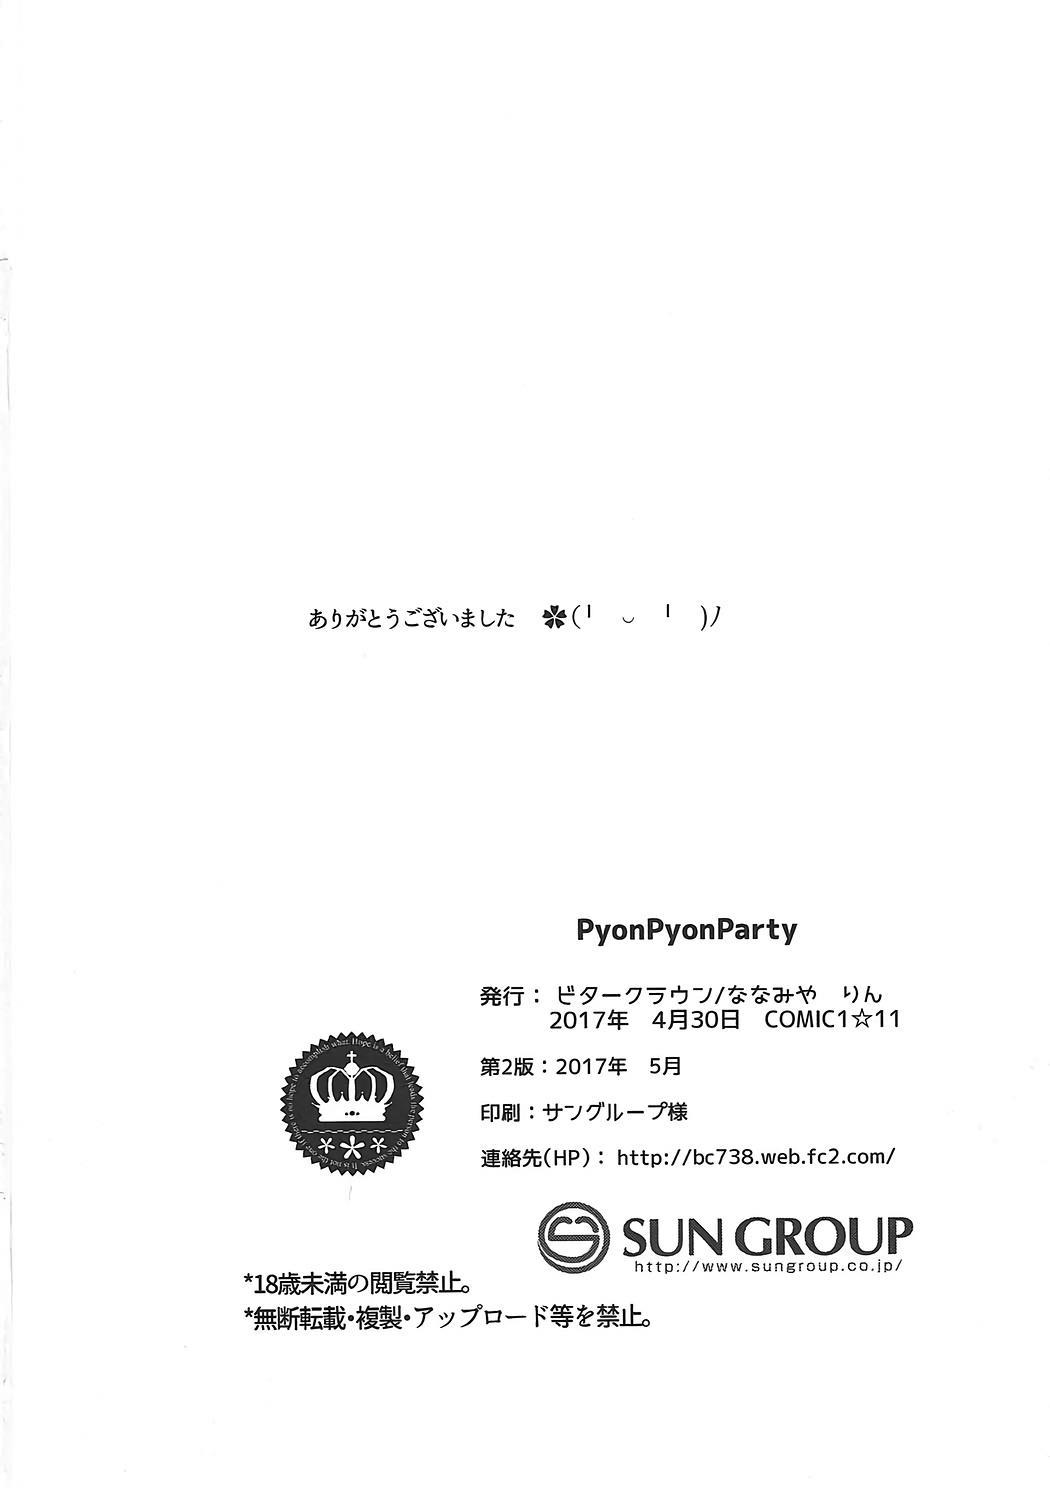 PyonPyonParty 12